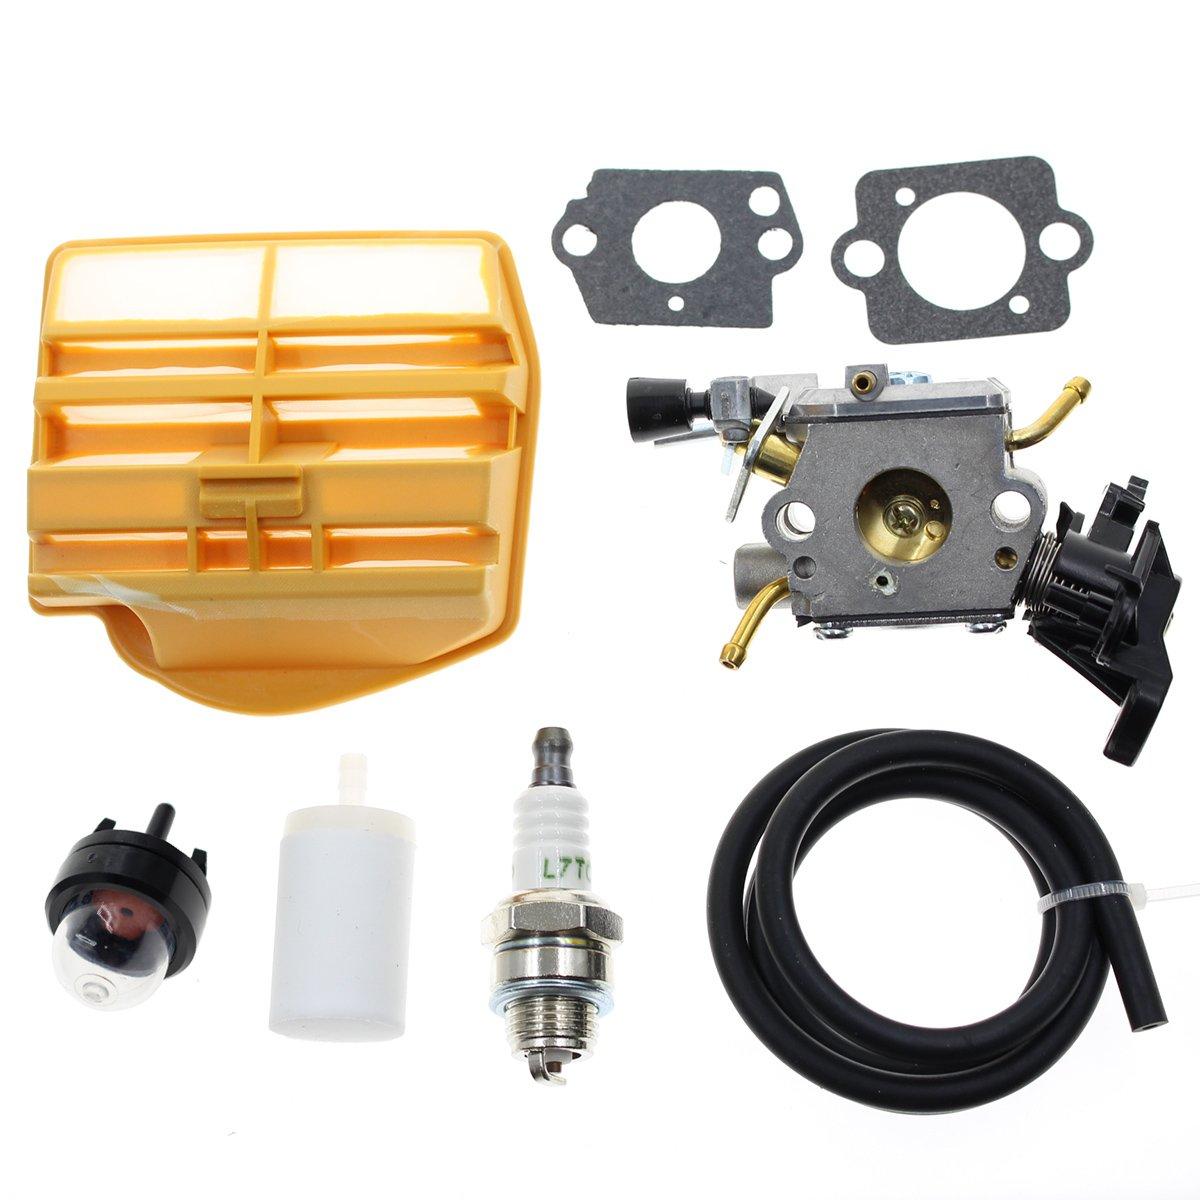 Carbhub C1M-EL37B Carburetor for Husqvarna 445 445E 450 450E Gas Chainsaw with Air Filter Tune Up Kit by Carbhub